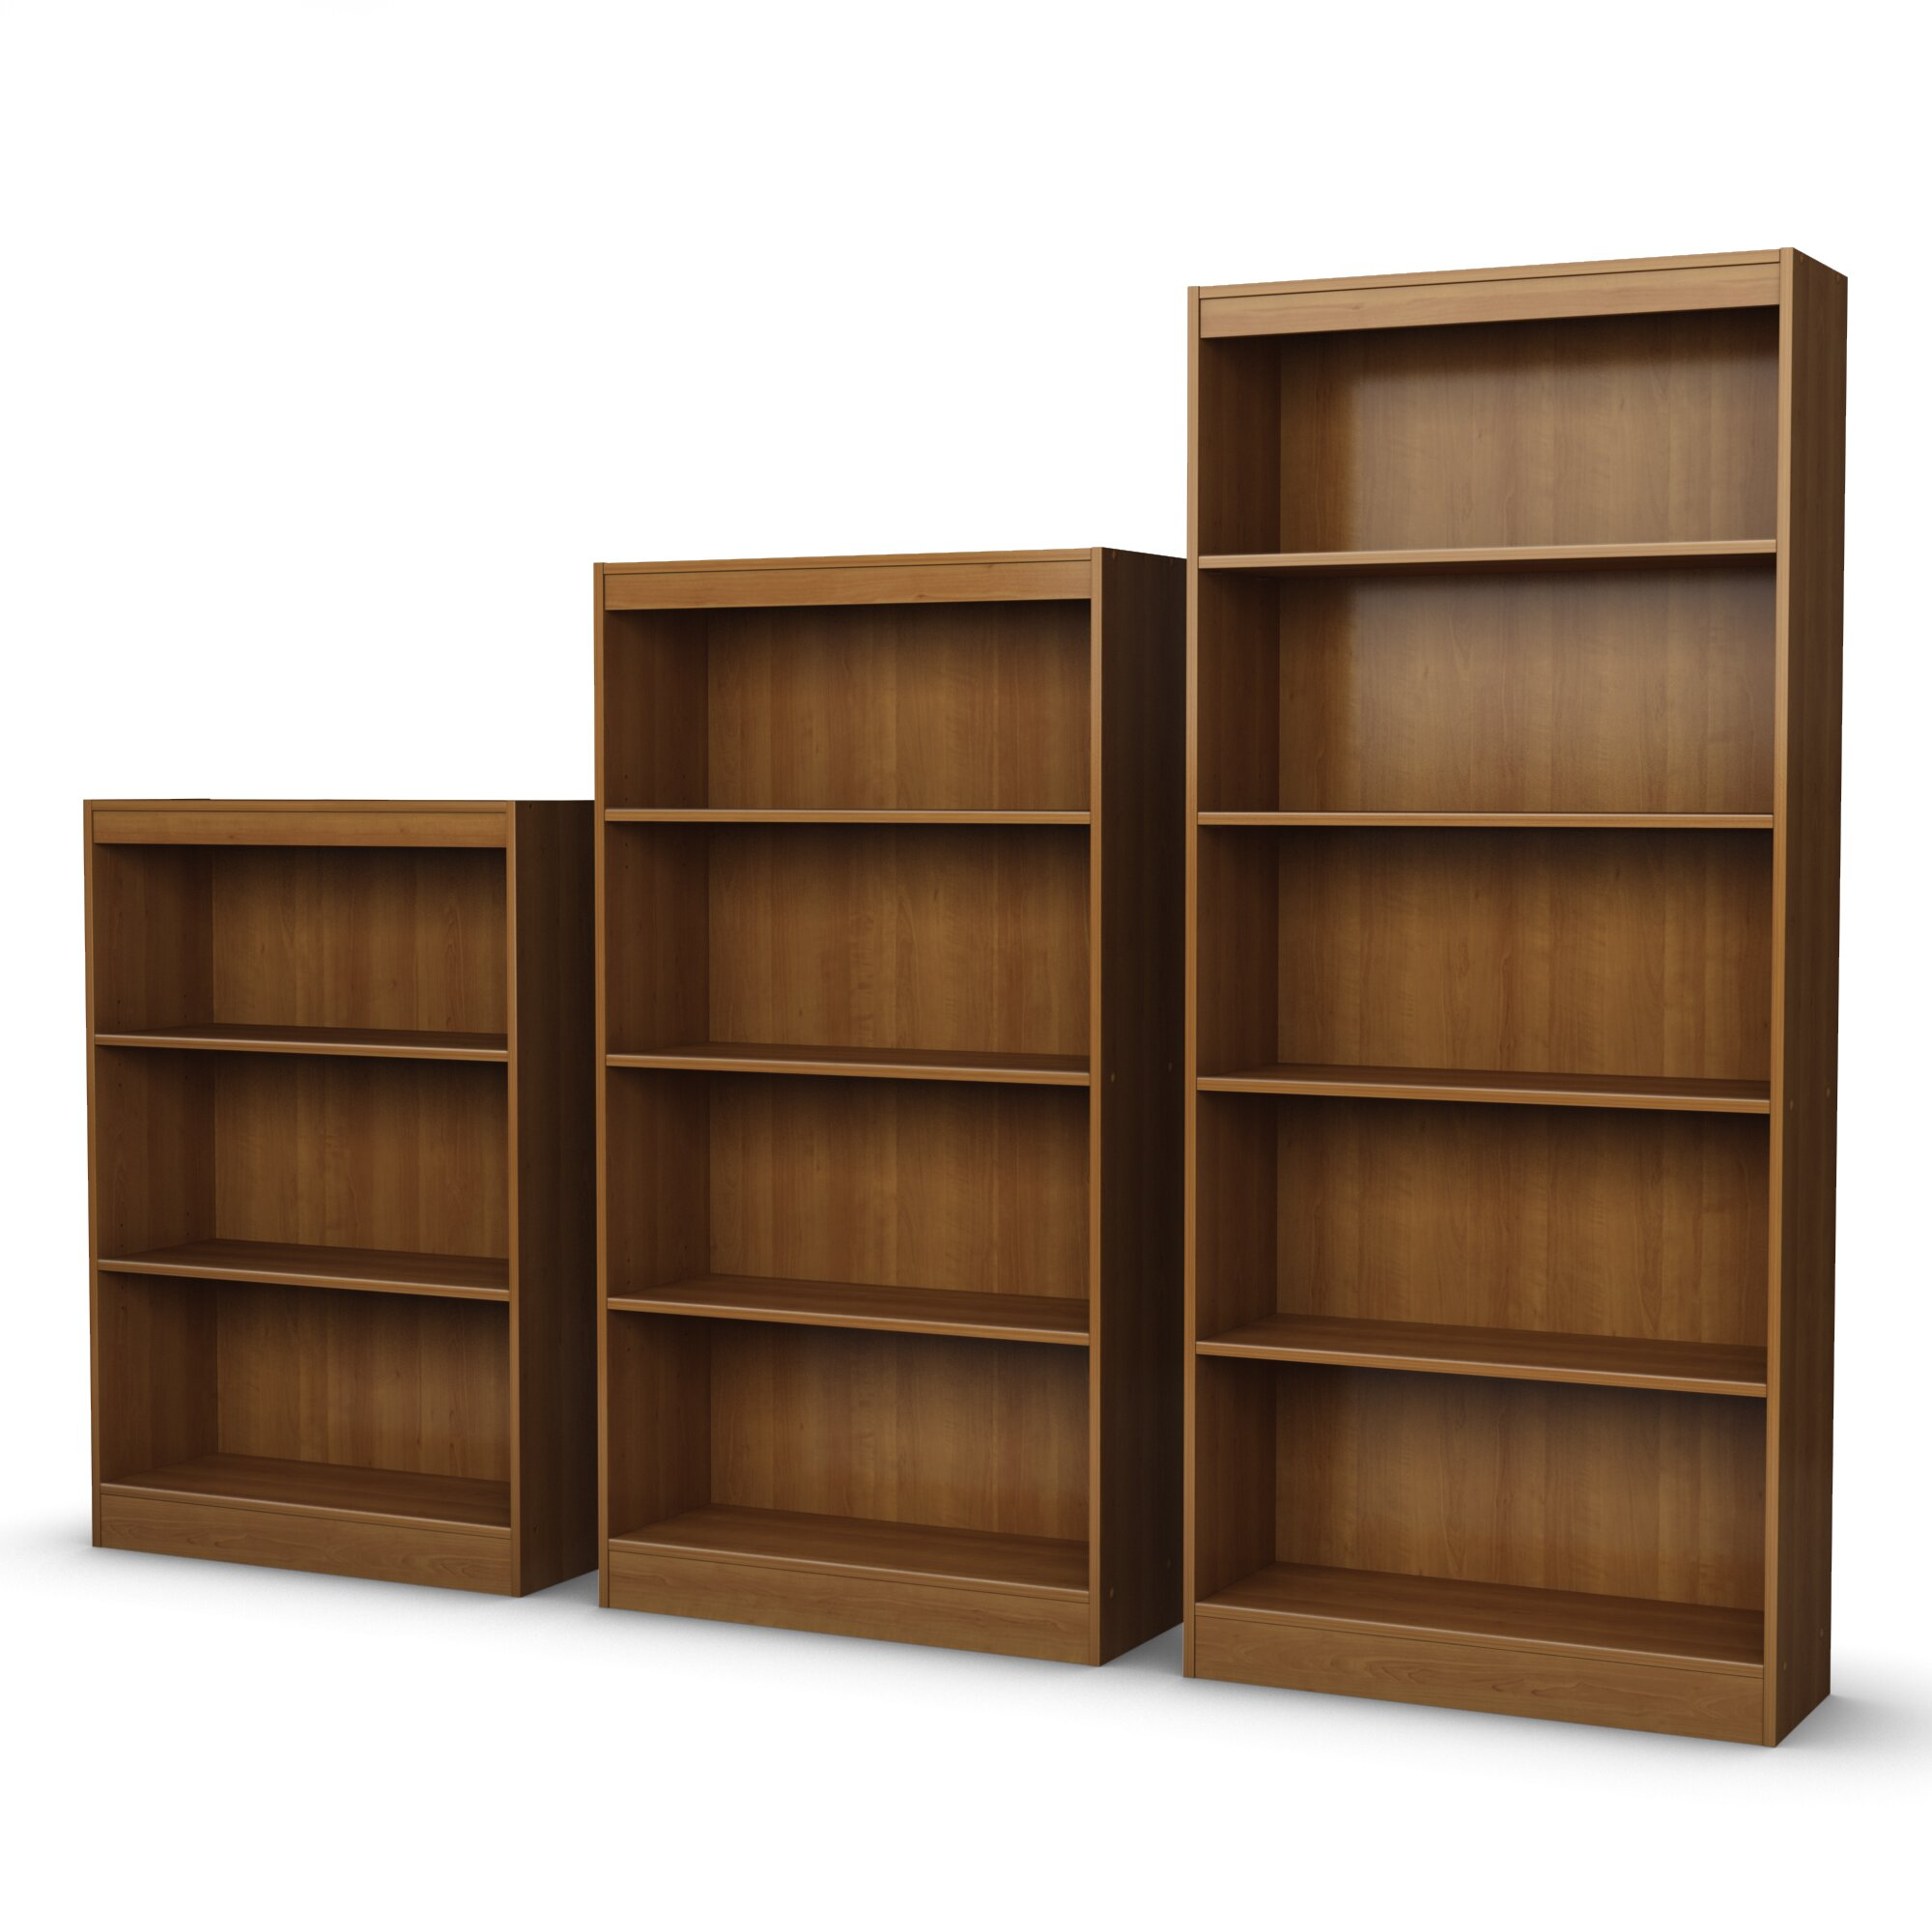 south shore axess 3 shelf 45 standard bookcase reviews. Black Bedroom Furniture Sets. Home Design Ideas